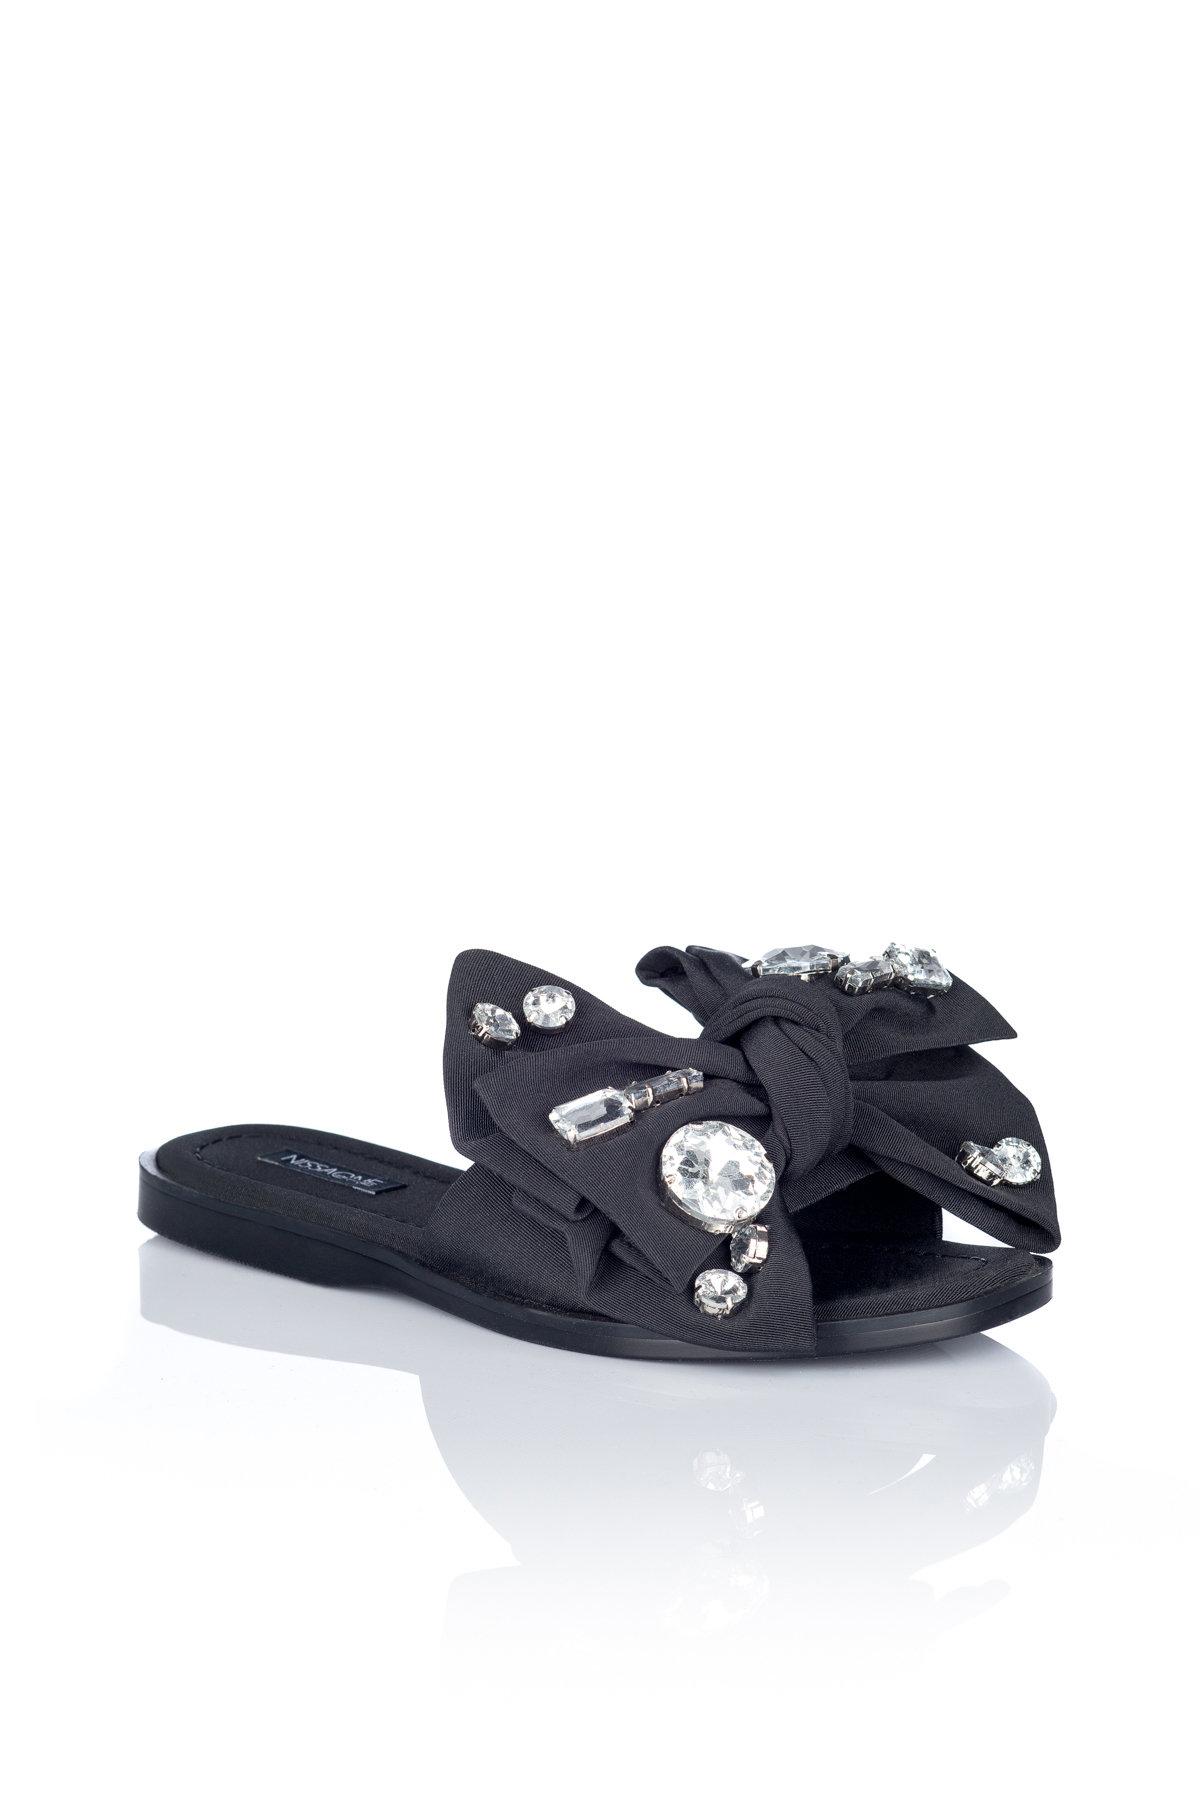 Incaltaminte / Pantofi Fara Toc